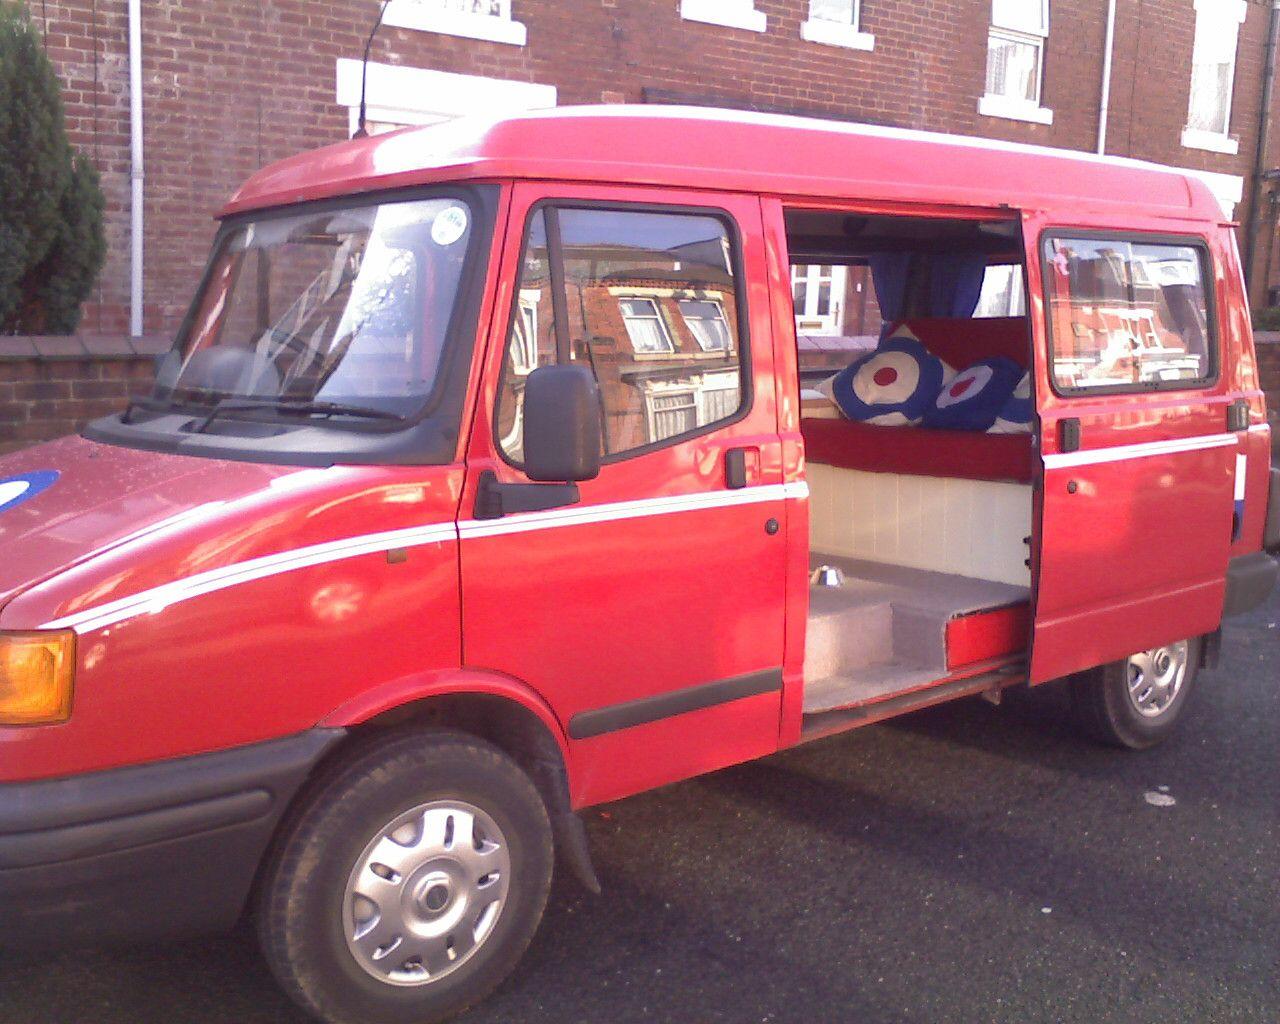 1996 LDV Pilot Minibus Which I Converted Into A Camper Van